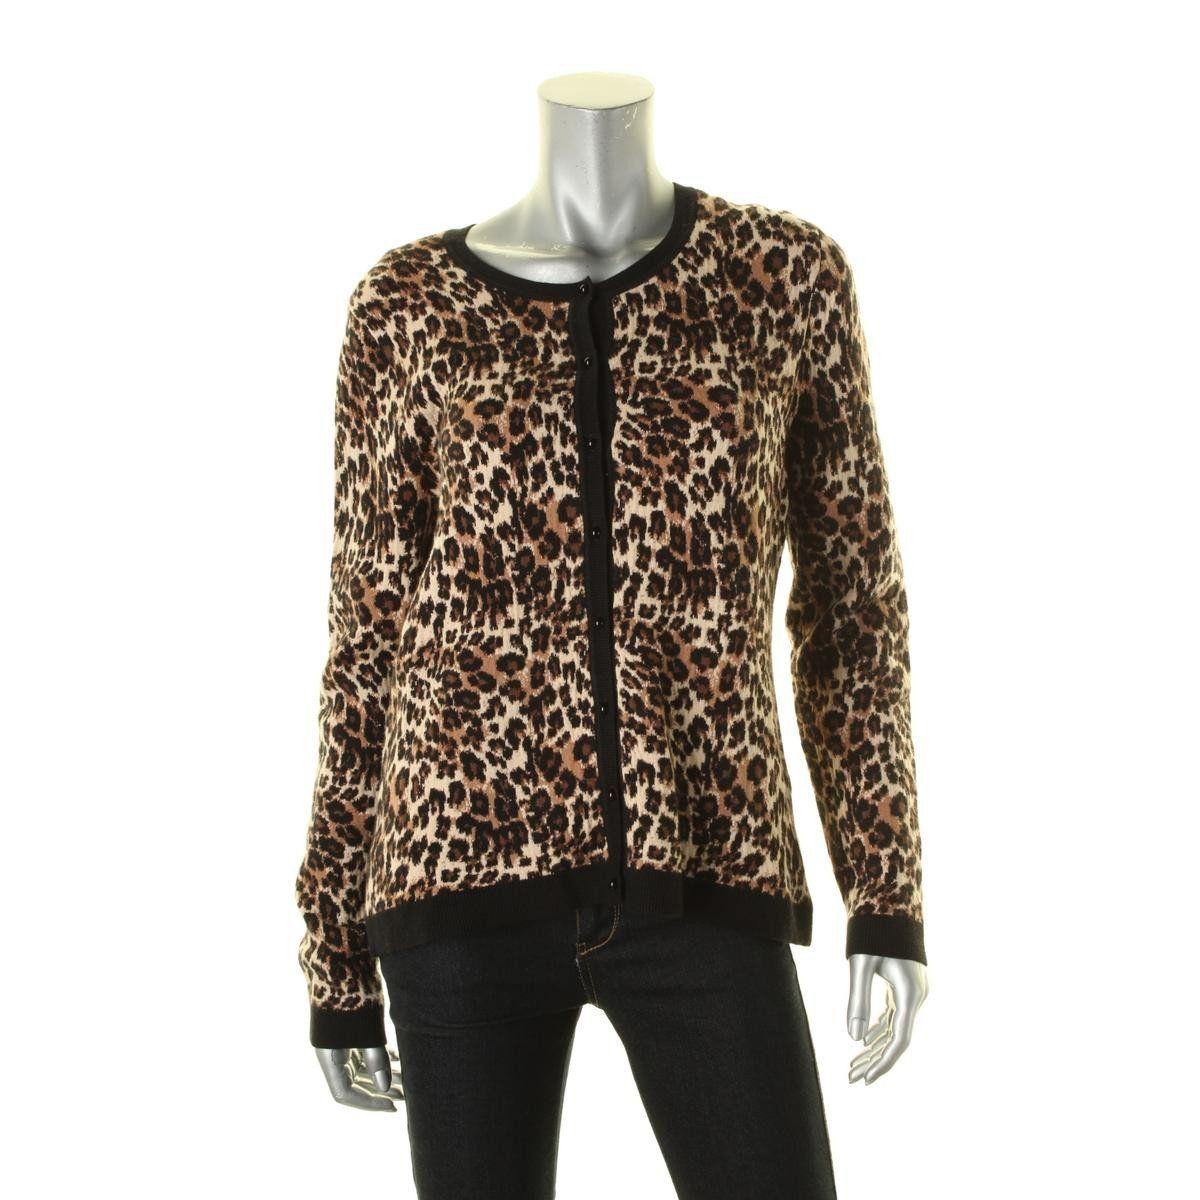 Womens Animal Print Contrast Trim Cardigan Sweater | Printing ...